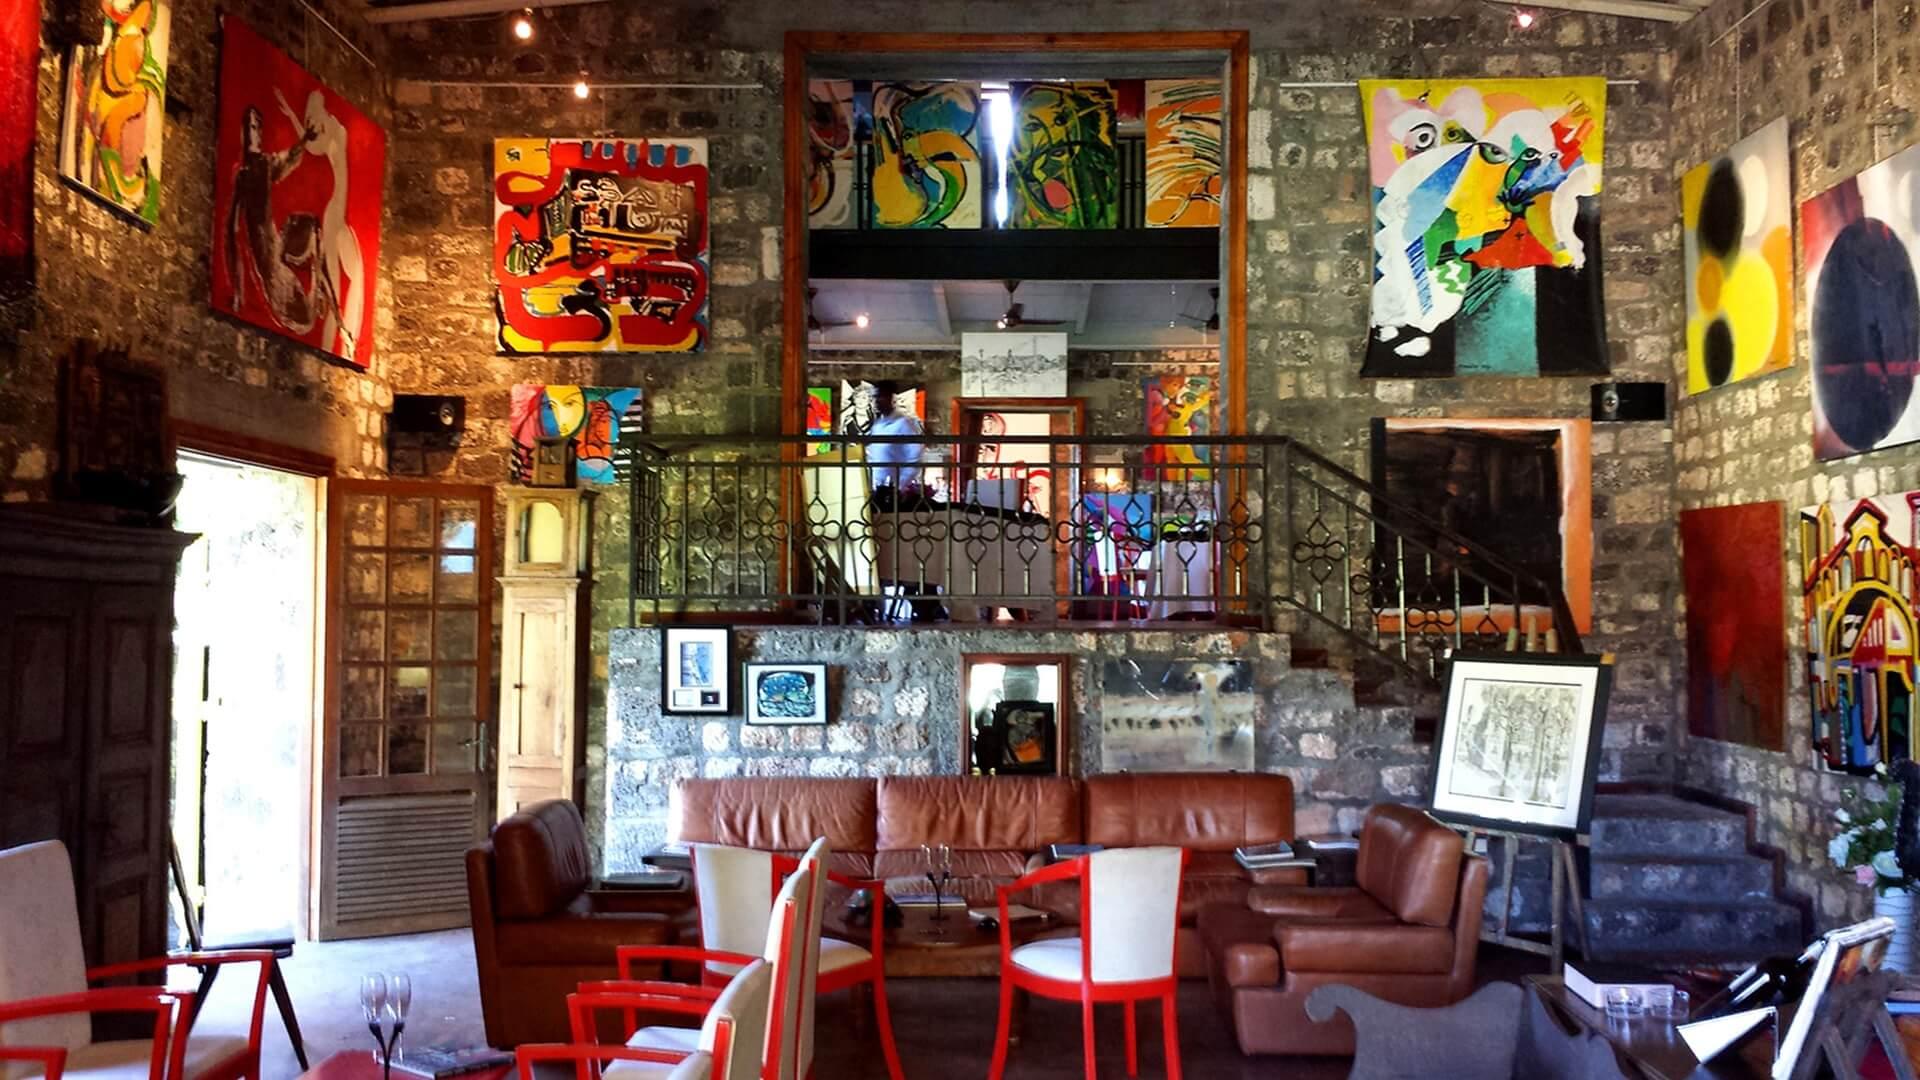 Le Cafe des Arts Mauritius